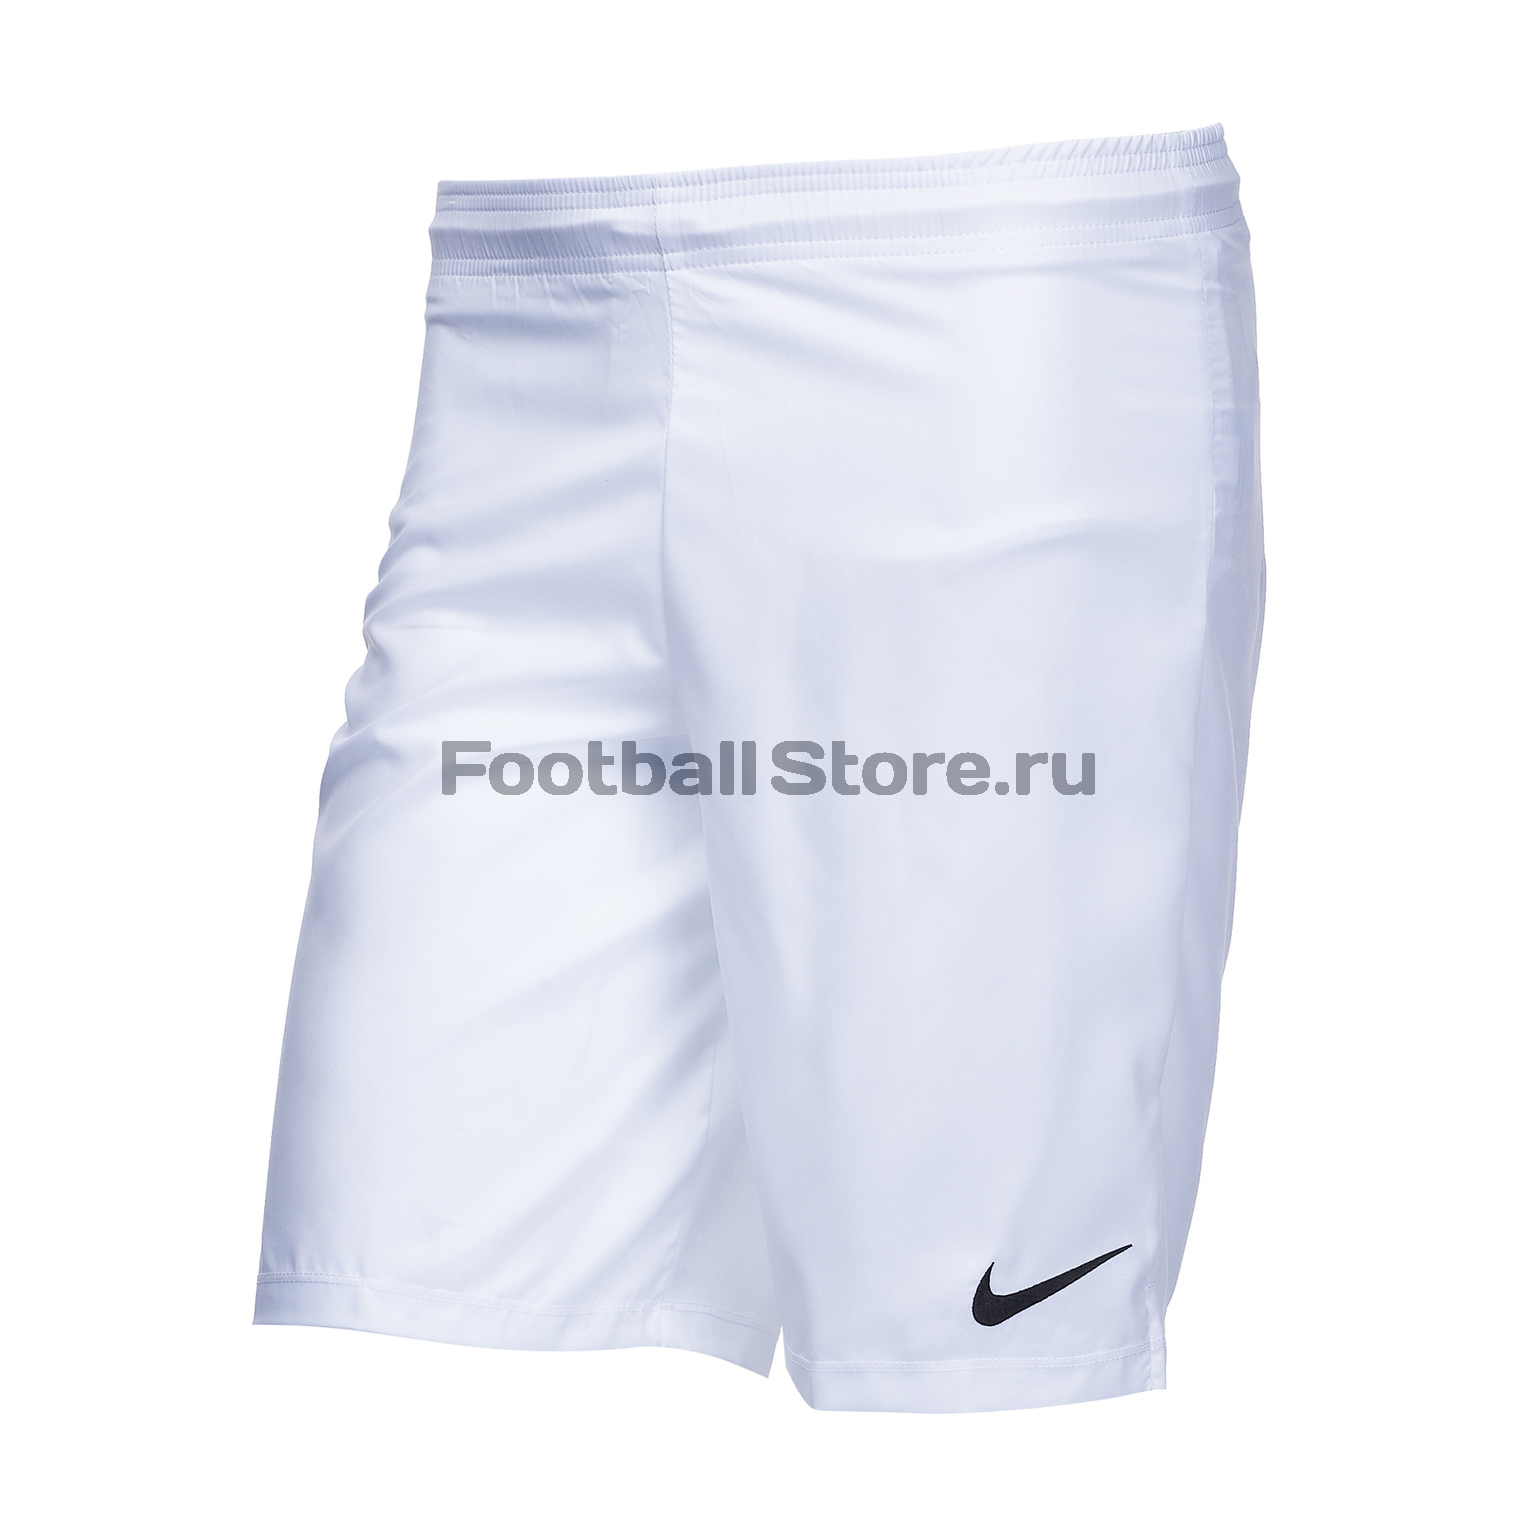 Шорты Nike Laser Woven III Short NB 725901-100